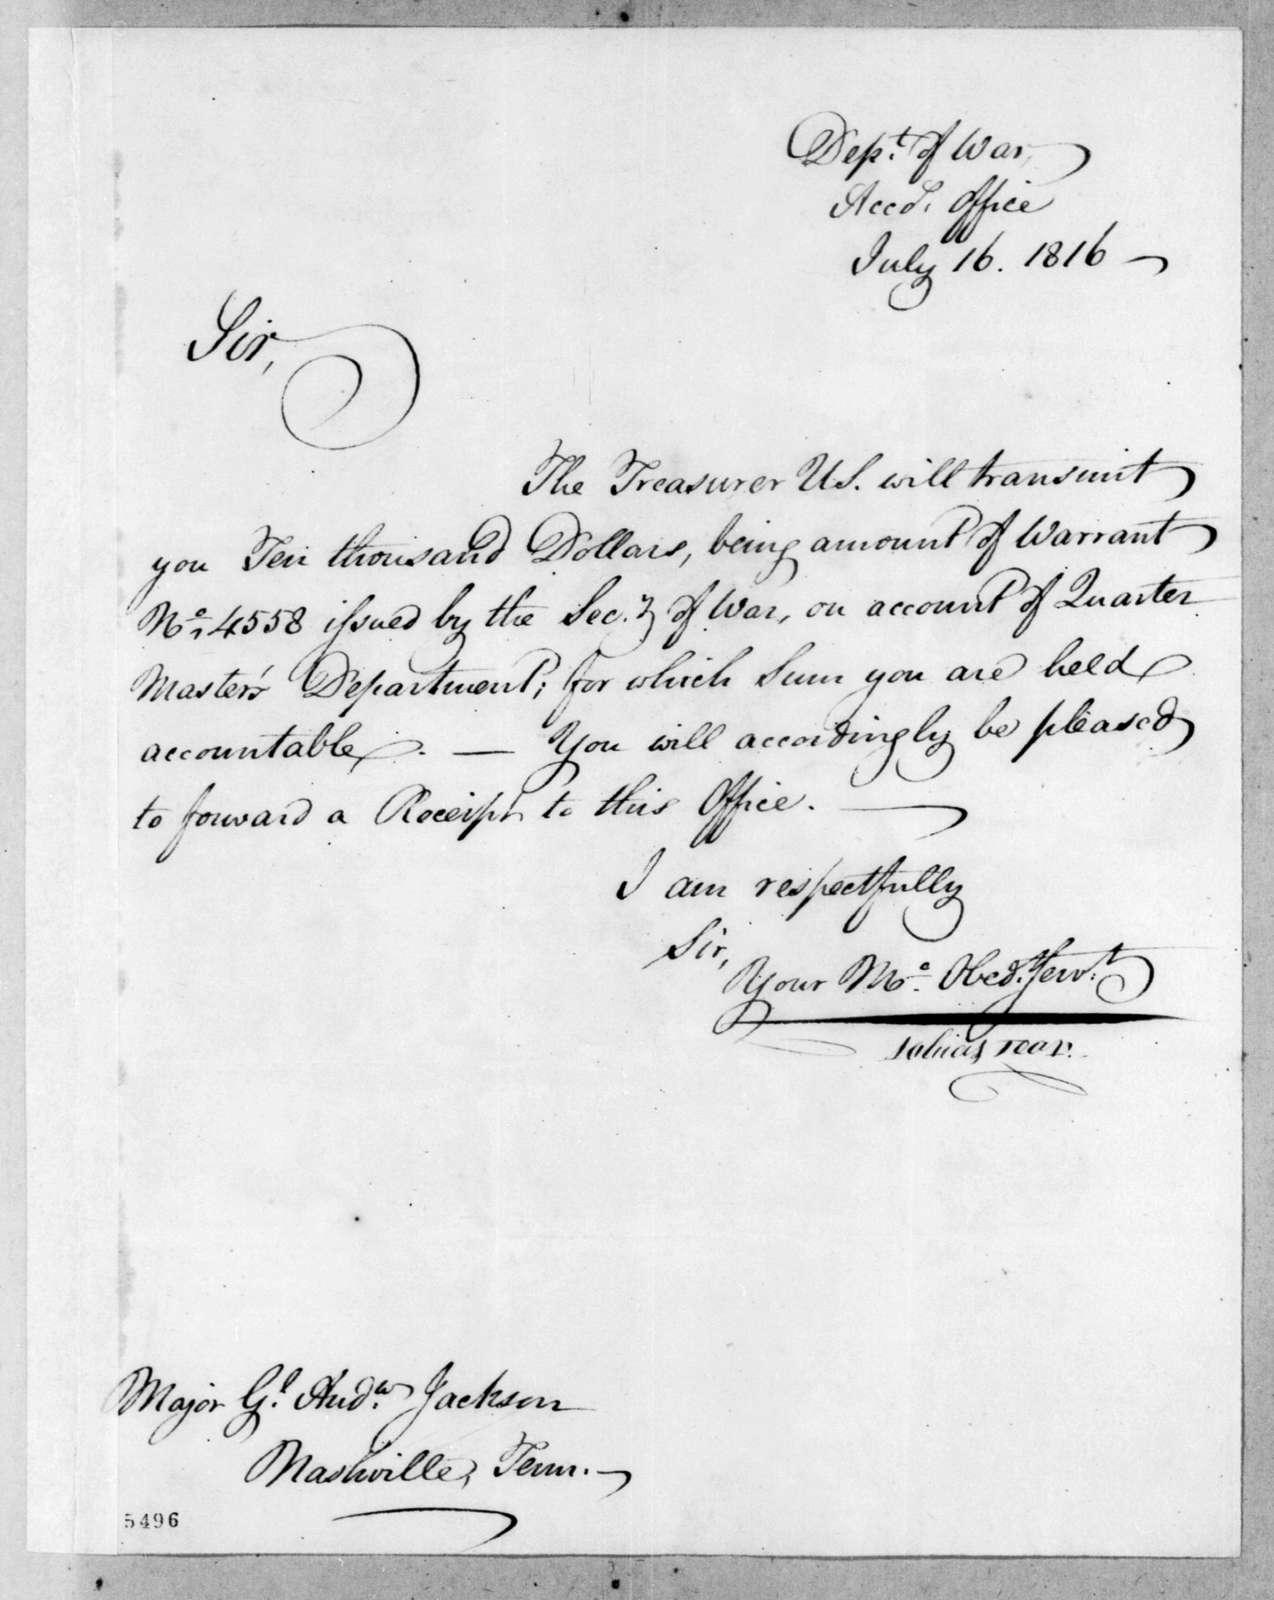 Tobias Lear to Andrew Jackson, July 16, 1816